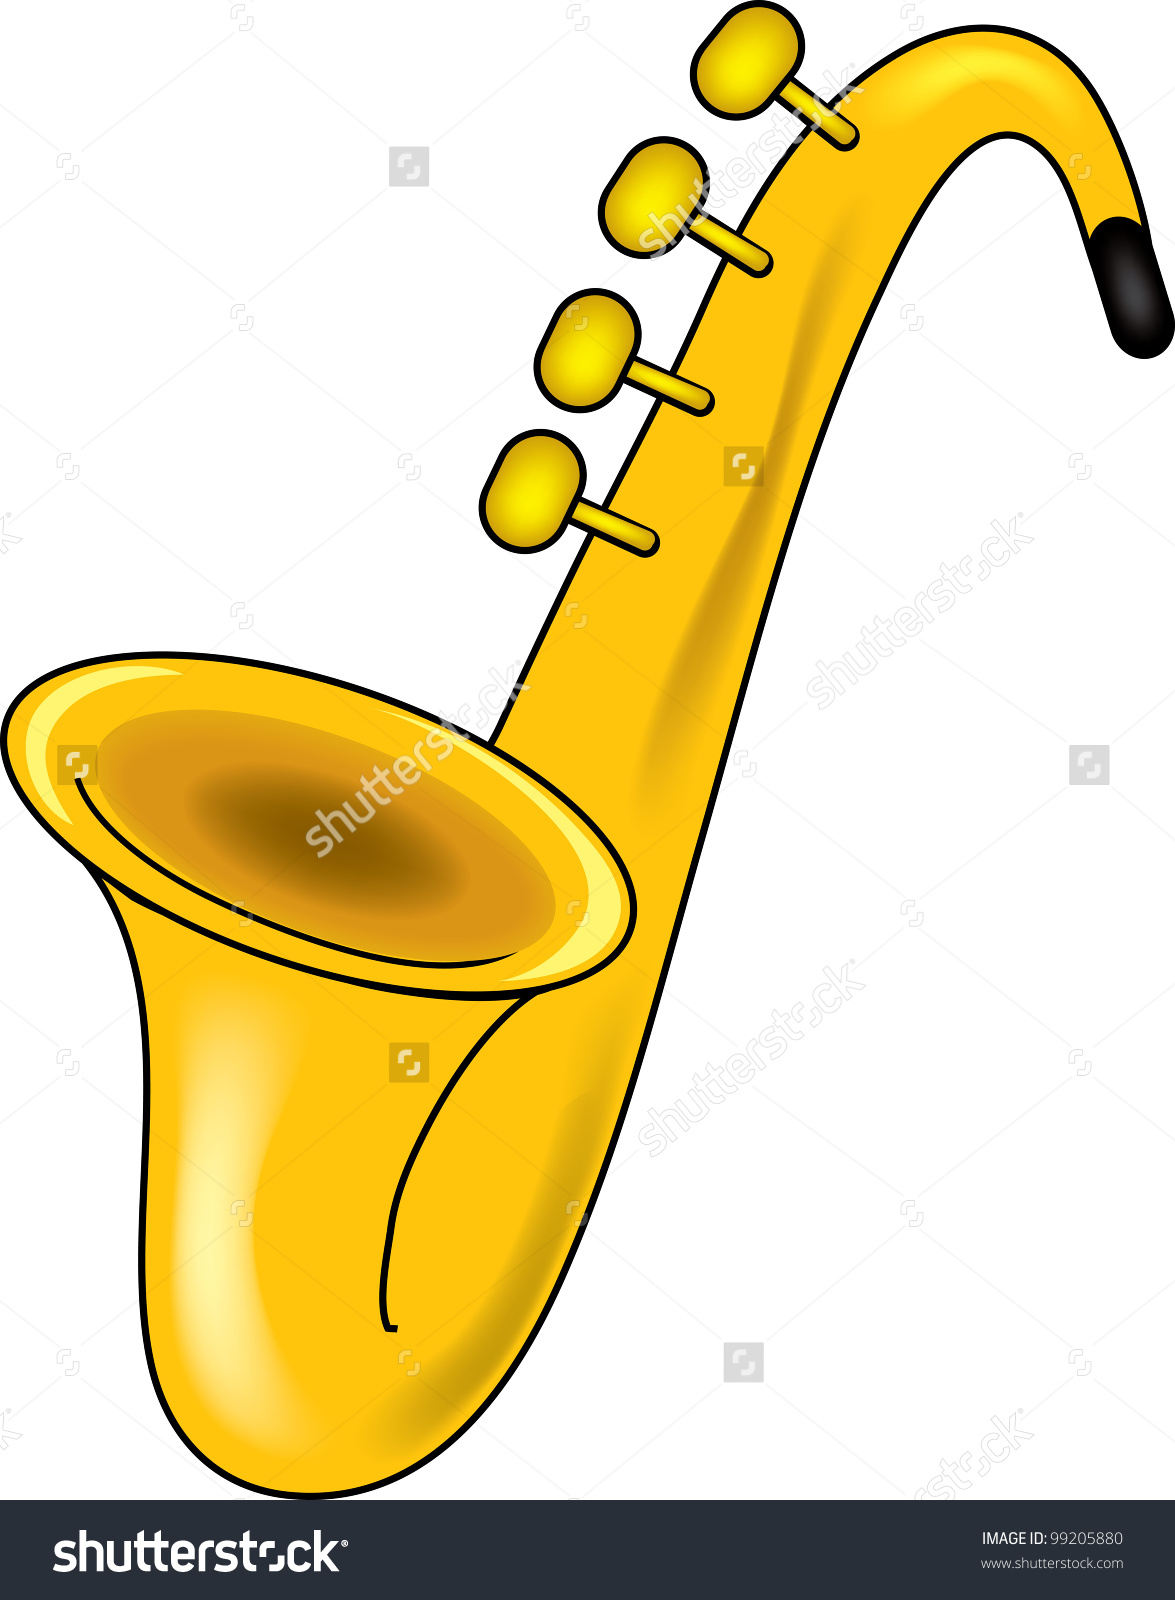 Clip Art Illustration Of A Saxophone.-Clip Art Illustration of a saxophone.-3